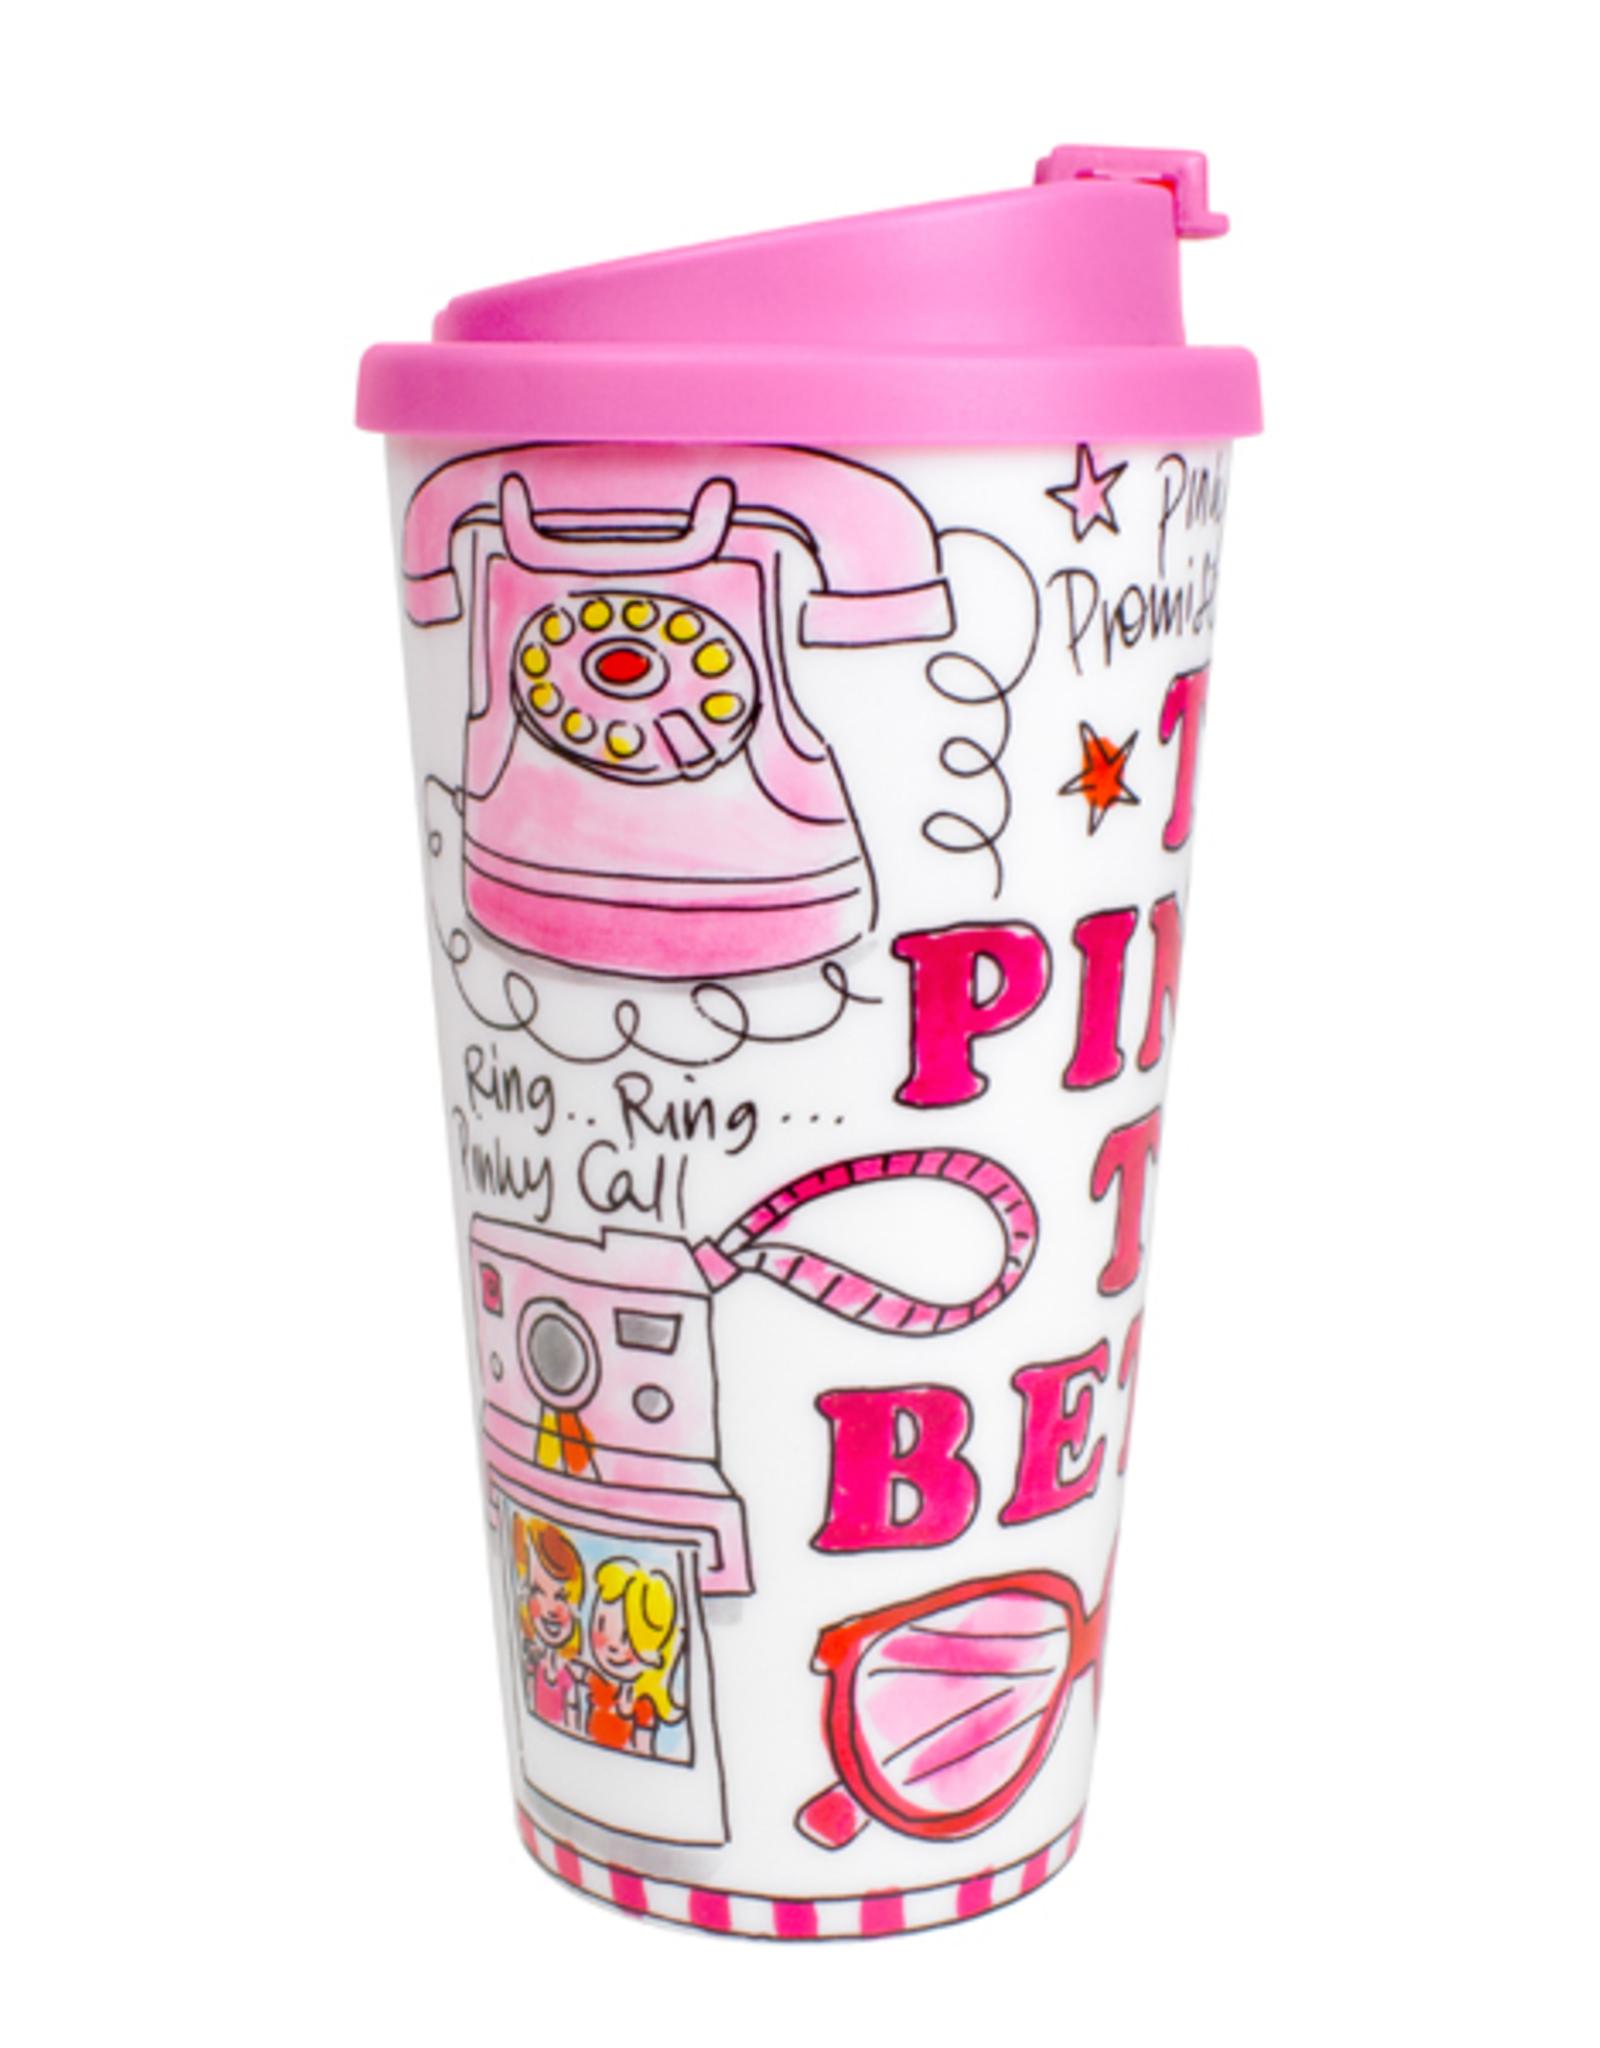 Blond Amsterdam Coffee To Go Pink Days - Blond Amsterdam